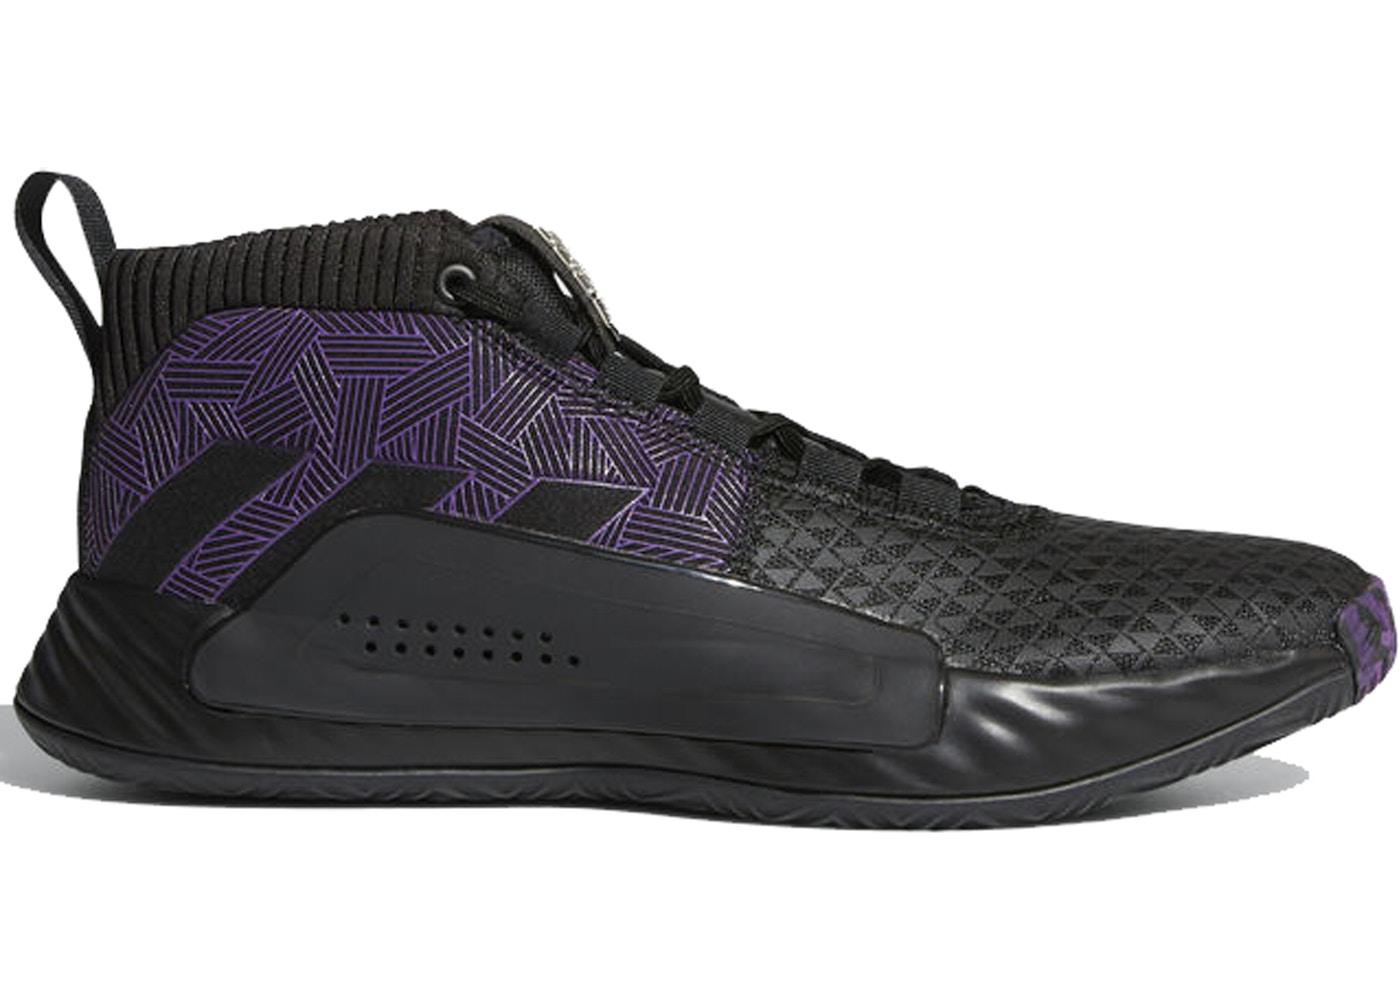 c958d8e6a6c7 adidas Dame 5 Marvel Black Panther - EF2259